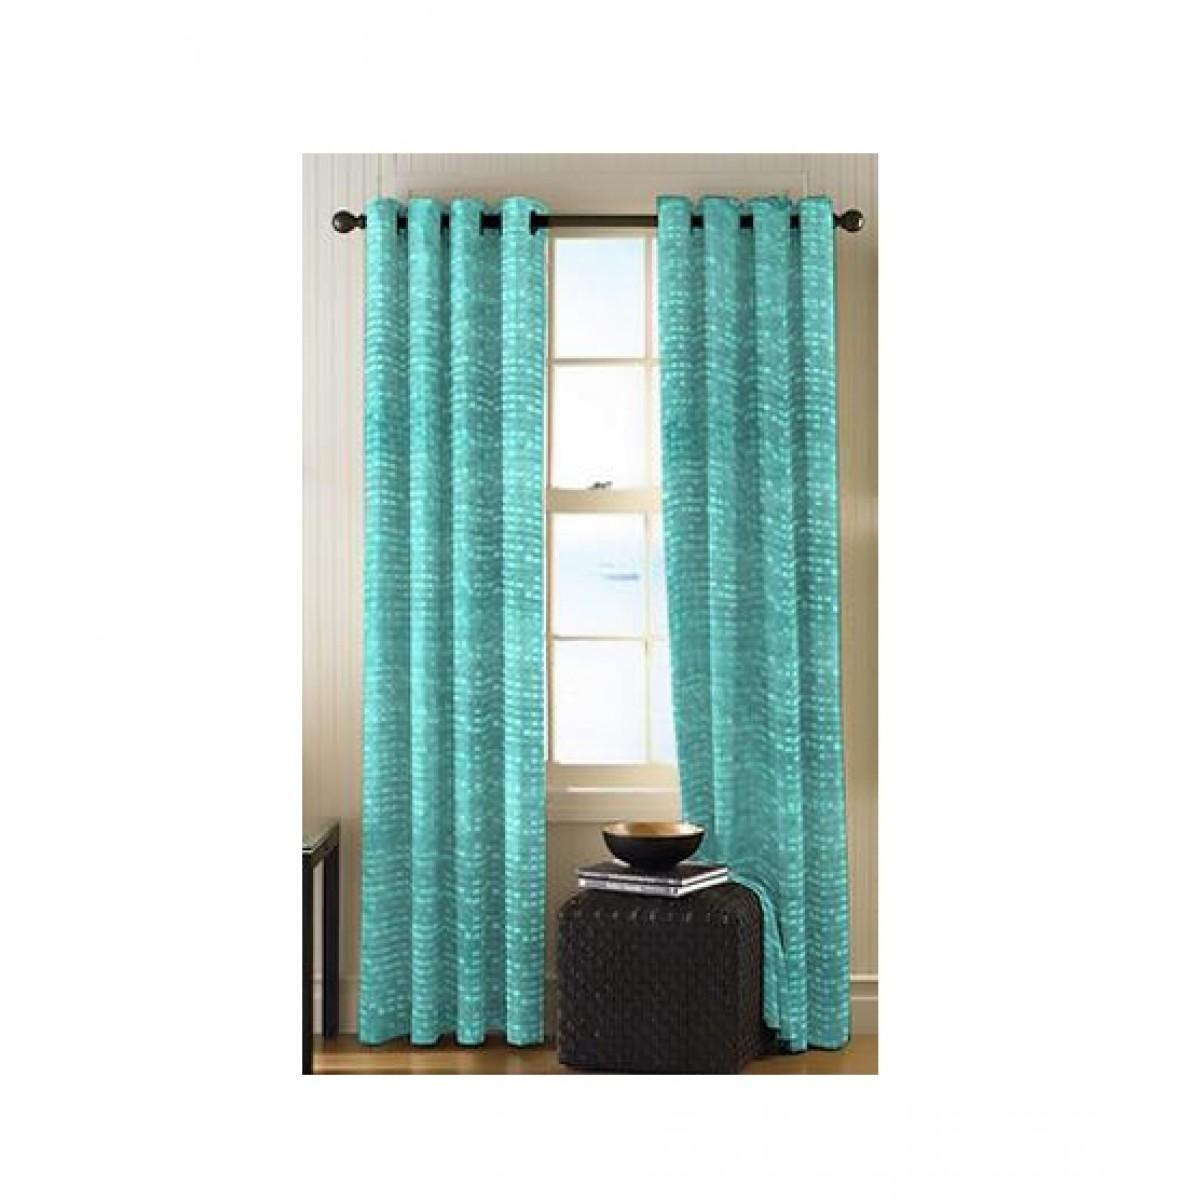 Maguari Zippered Mattress Cover Price In Pakistan Buy Pair Of Pq Jacquard Curtain Sea Green 0038 Ishopping Pk